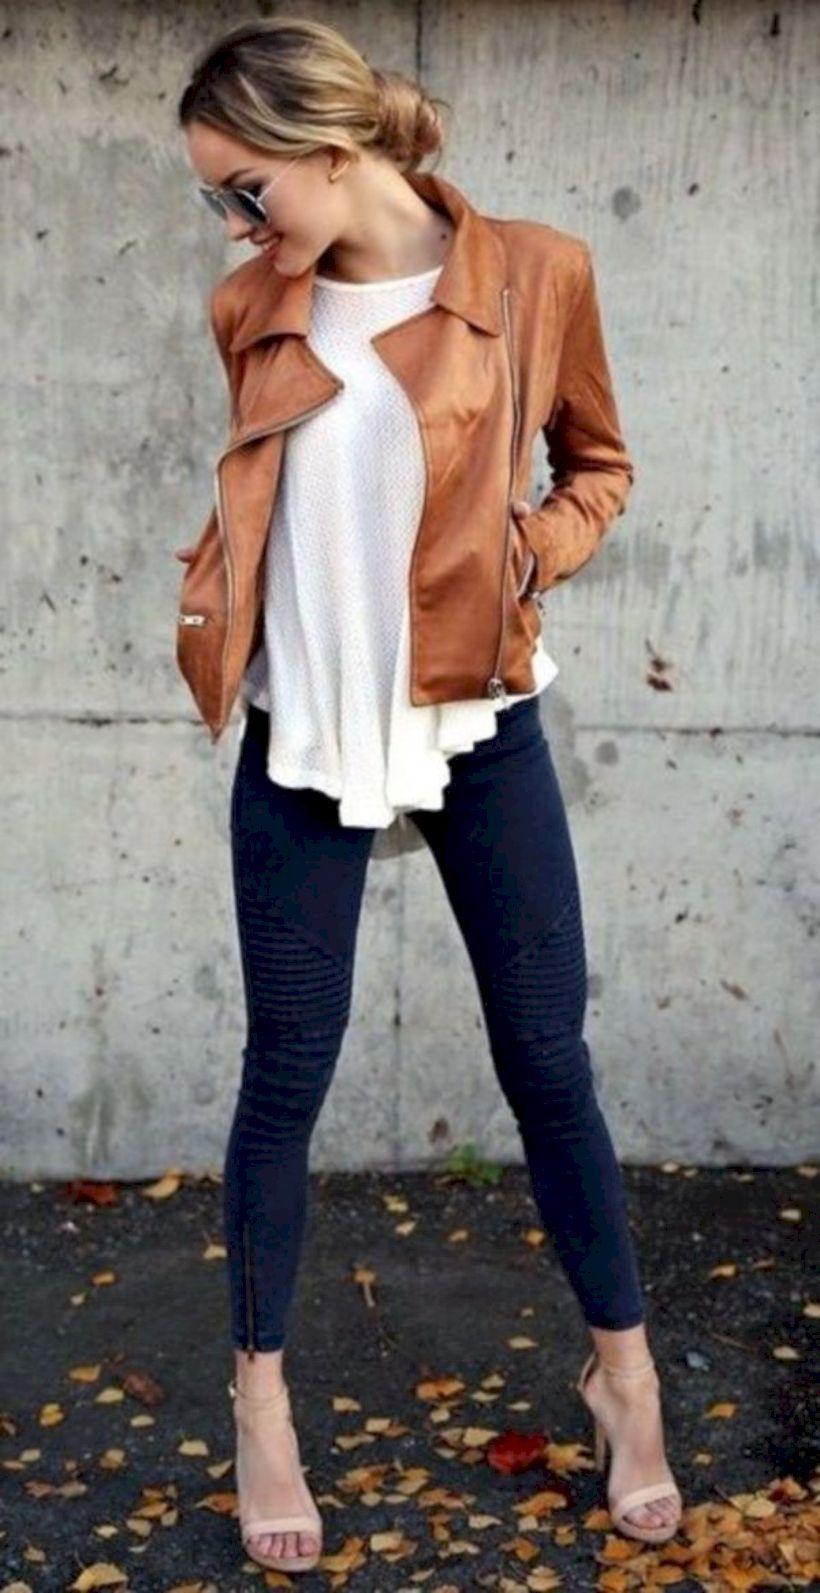 49 Amazing Casual Outfit Ideas To Summer This Year Estilo Casual Mujer Ropa Casual Elegante Ropa De Moda